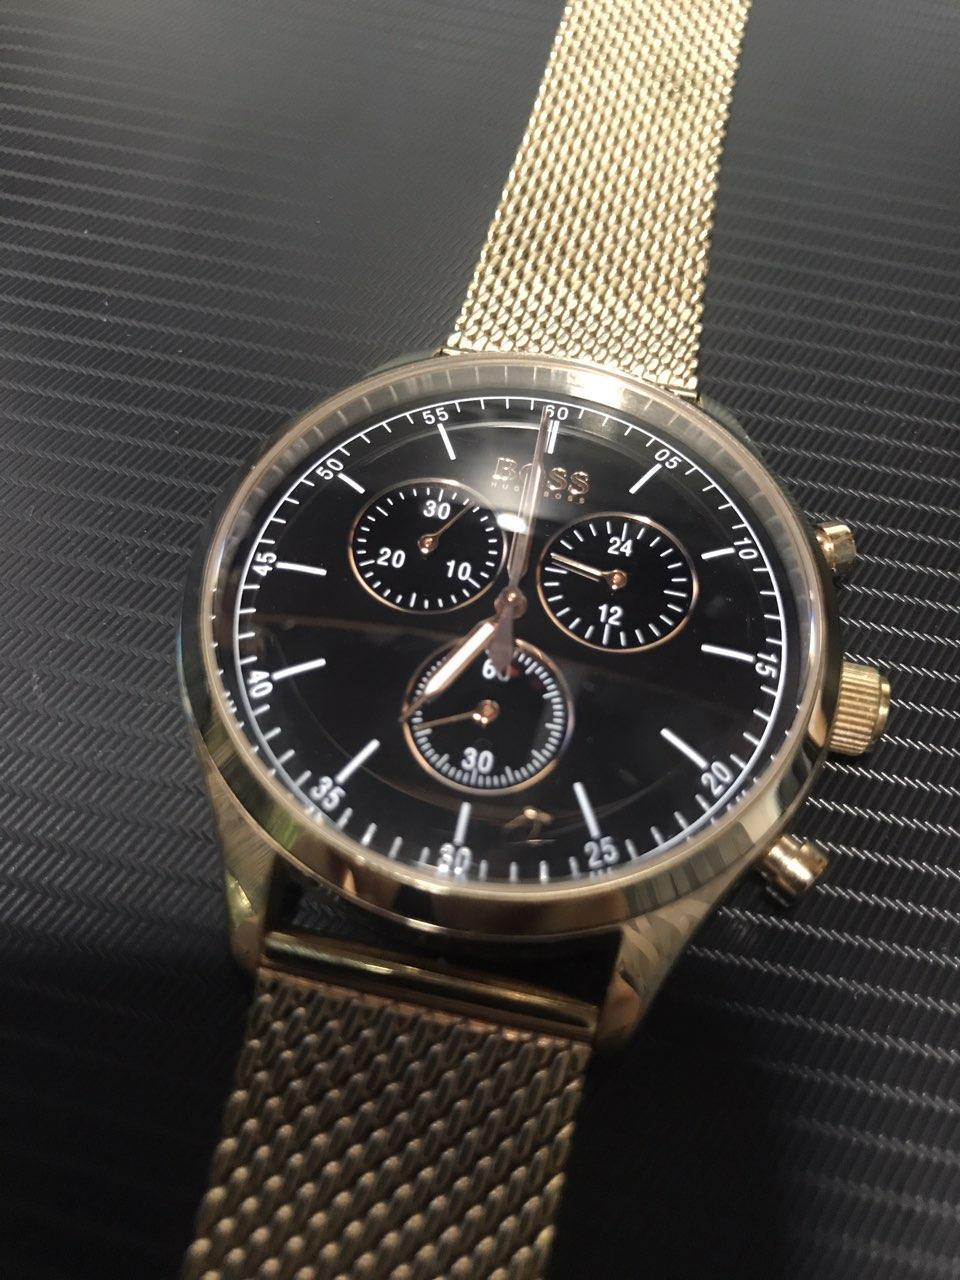 Кварцевые водонепроницаемые часы Hugo Boss Companion Chronograph Gents Mesh Watch 1513548